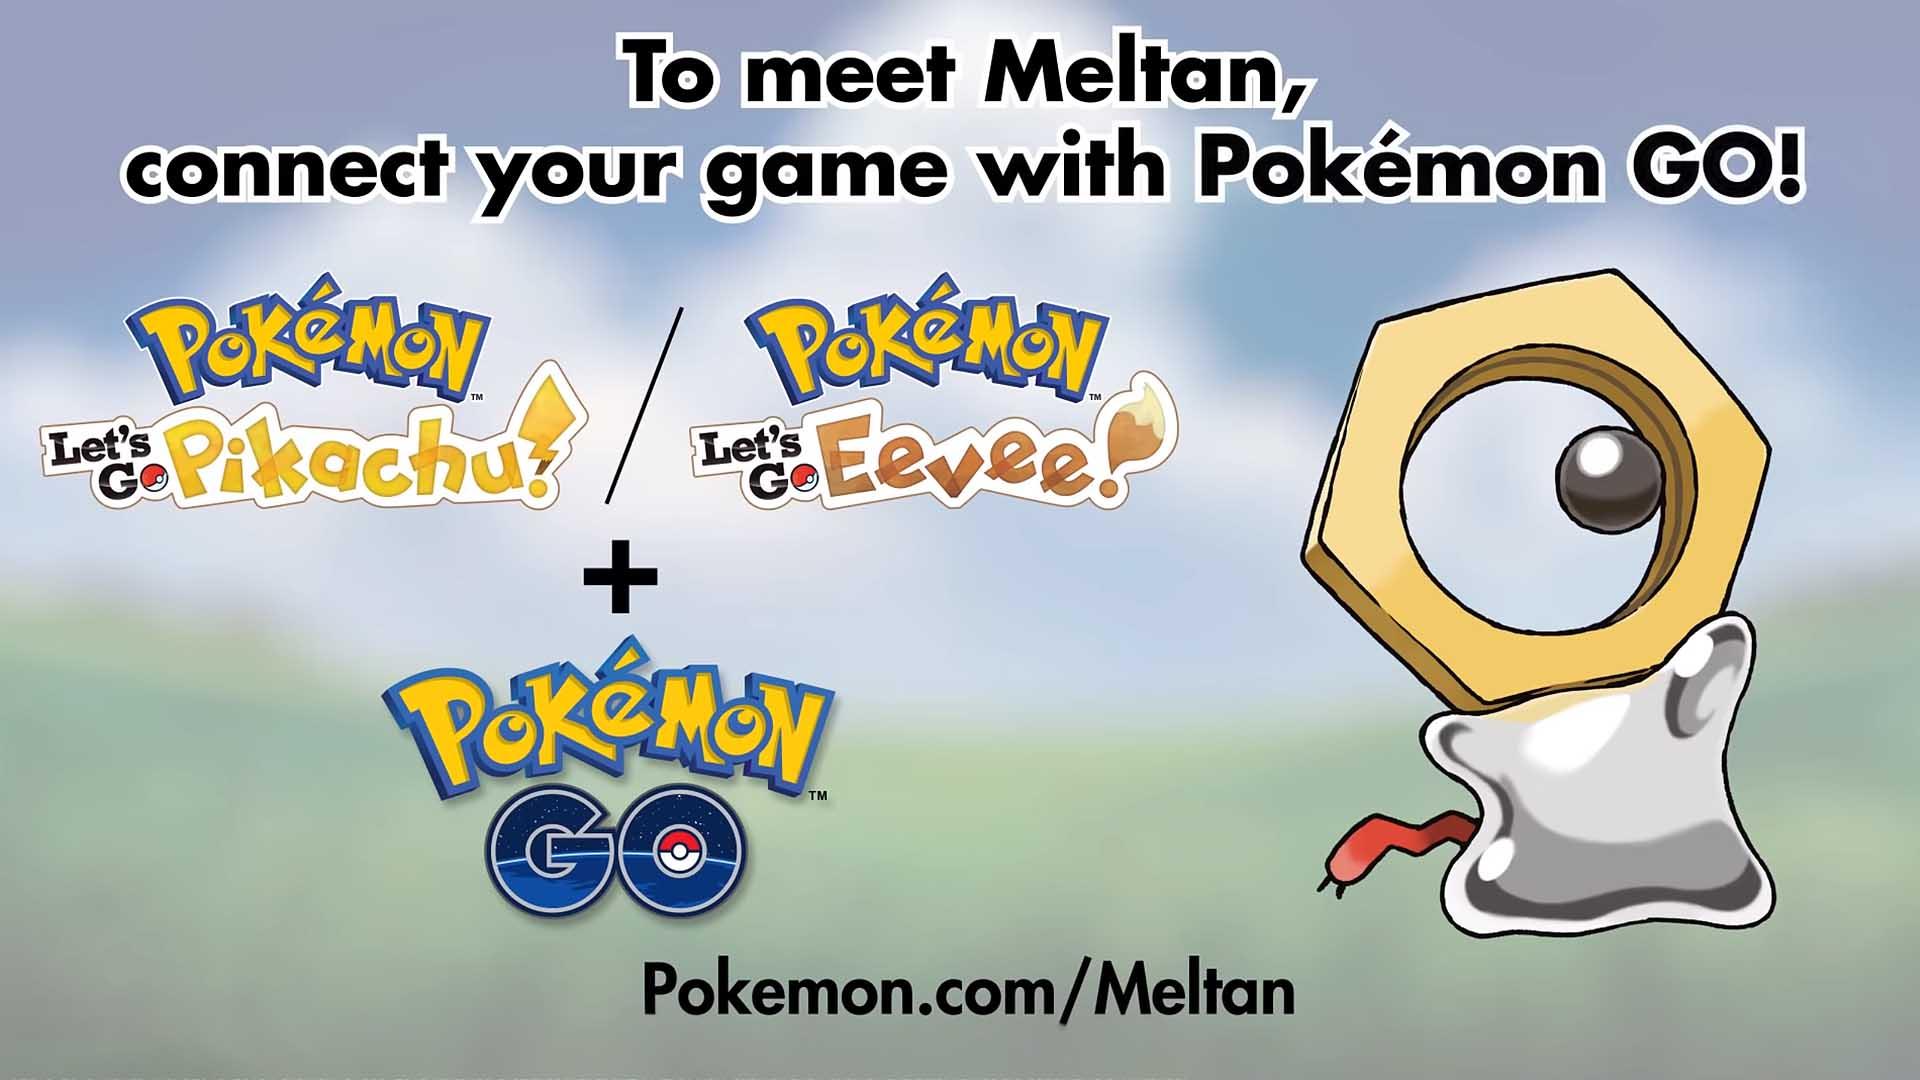 Nintendo Details Its New Mythical Pokémon Meltan